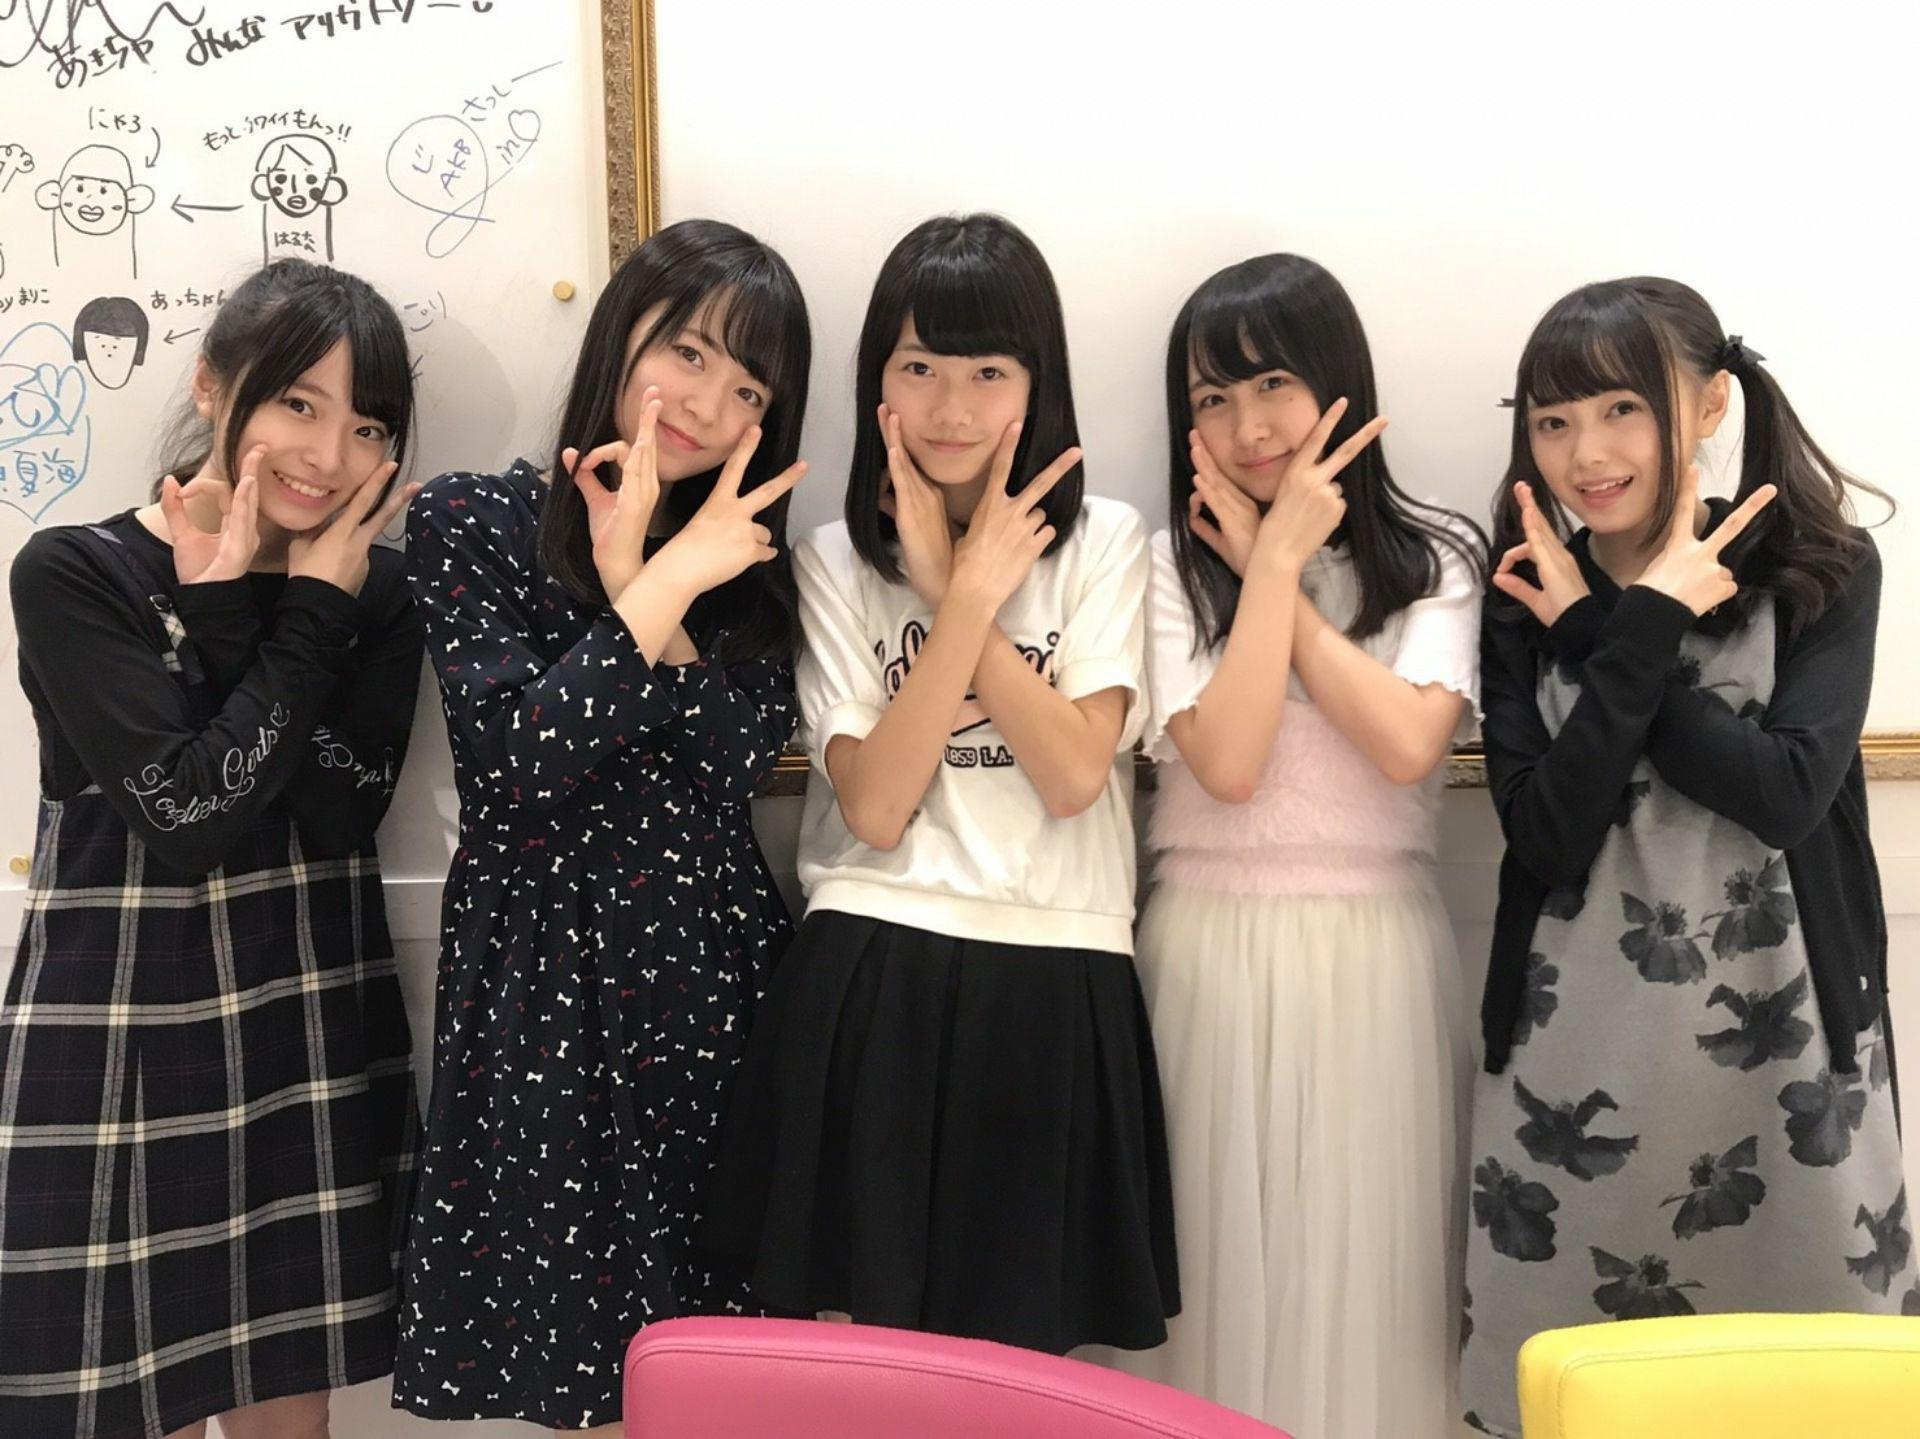 【AKB48】千葉恵里ちゃん応援スレ☆8【えりい】©2ch.netYouTube動画>4本 ->画像>530枚